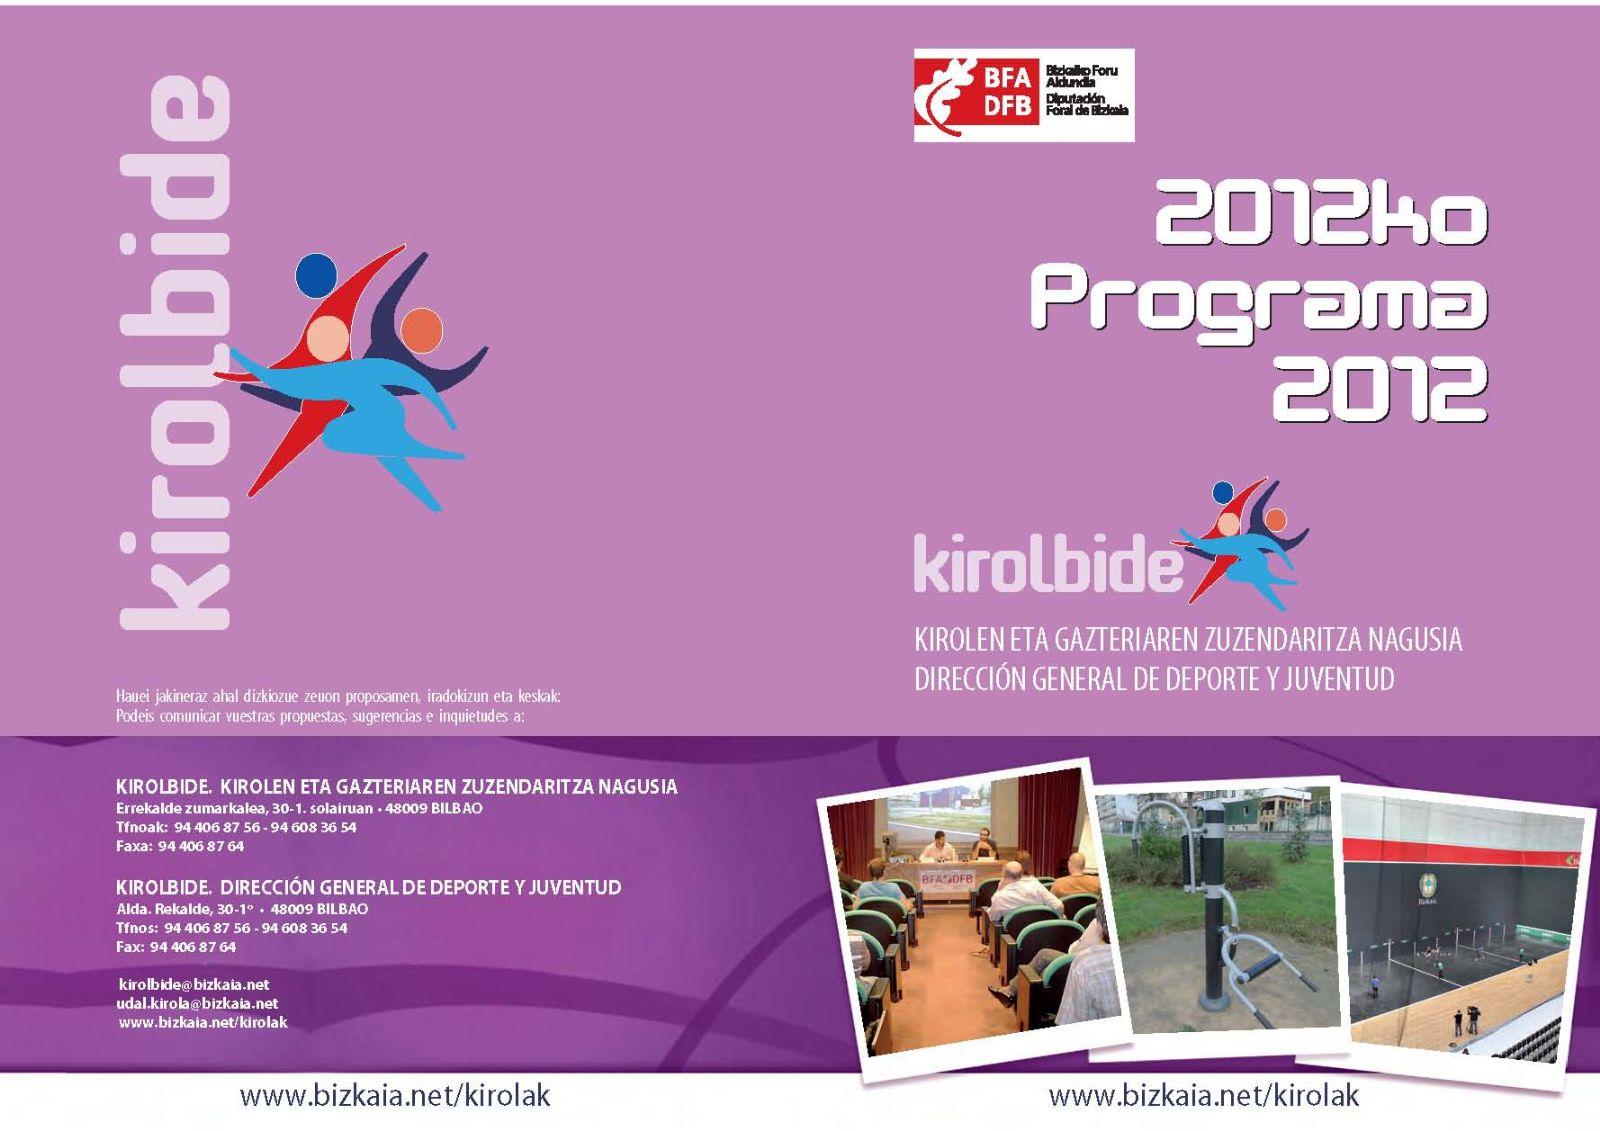 Acceso al documento, con formato PDF,  DIPTICO KIROLBIDE 2012Def(1).pdf (272 KiloBytes)